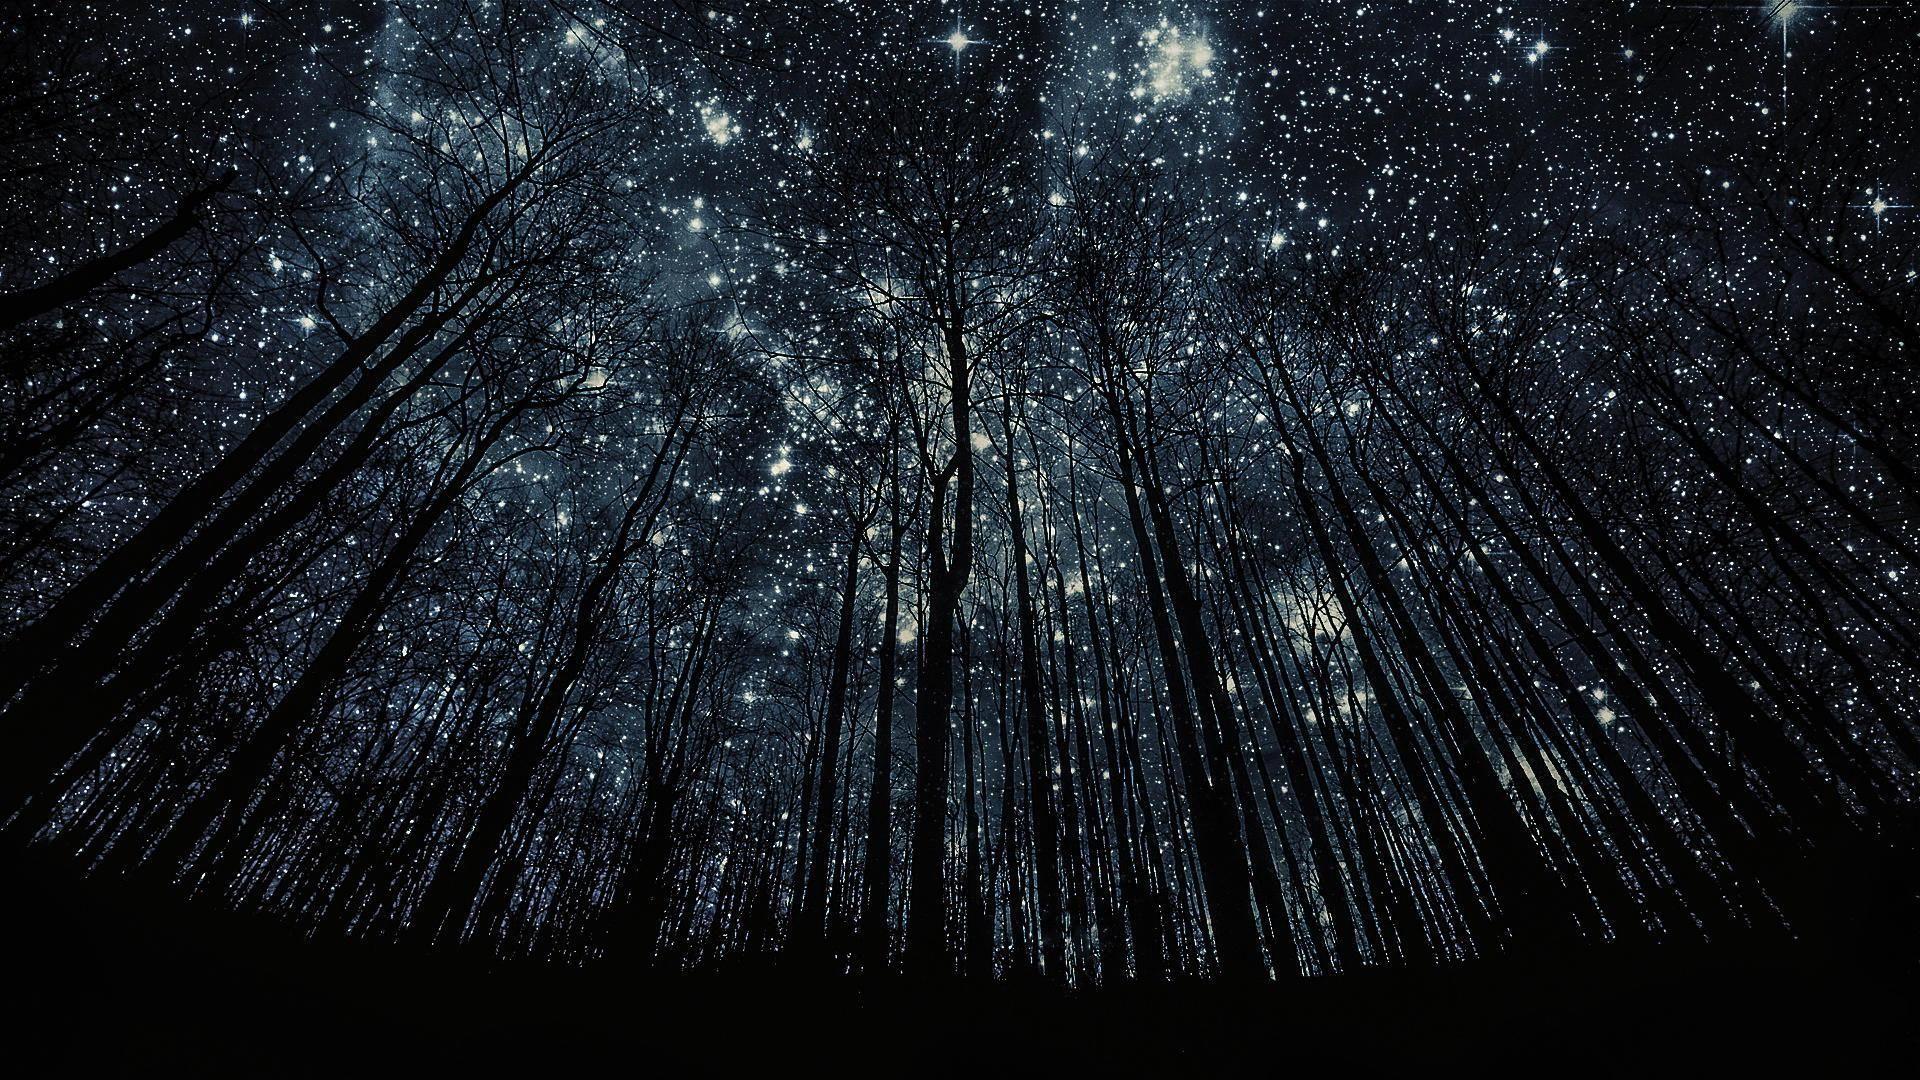 My Poetry Stars Night Sky Wallpaper Night Sky Photos Starry Night Wallpaper